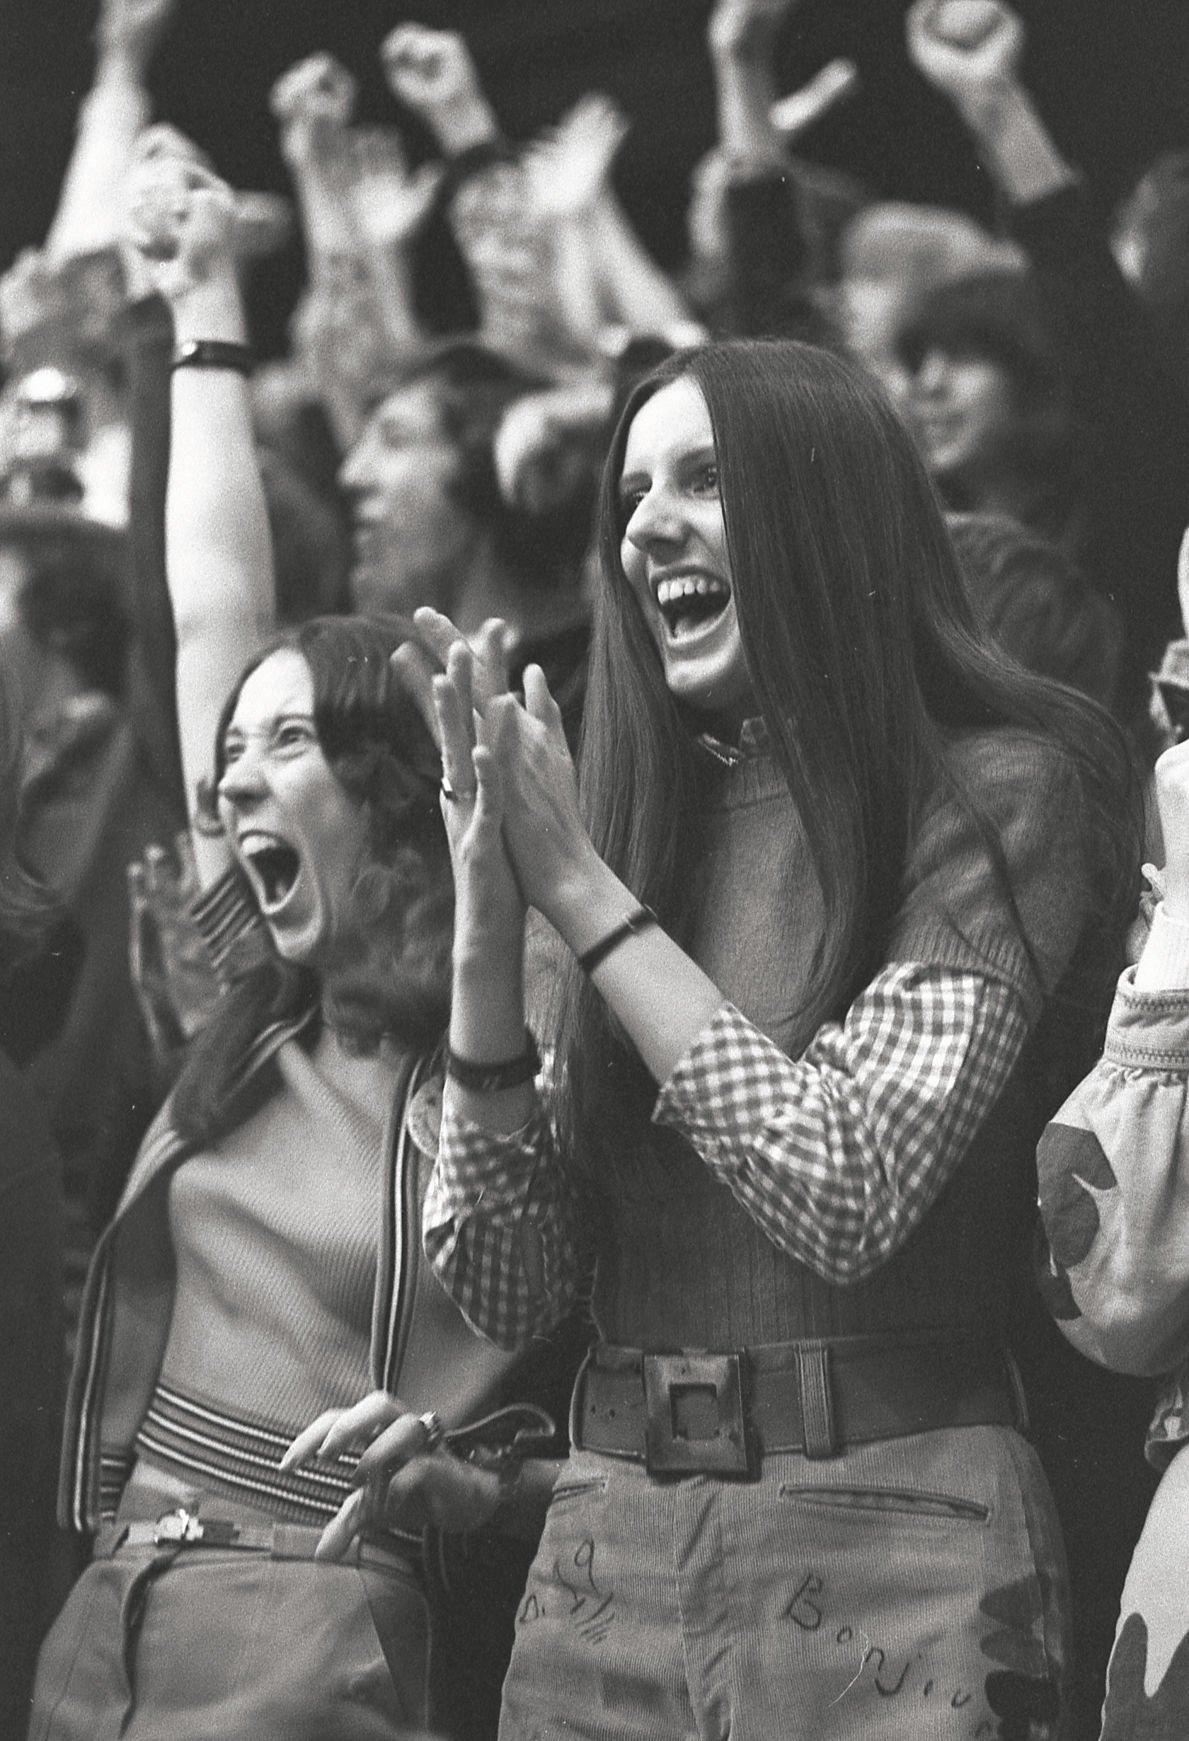 Haworth-Kokomo fans 1975